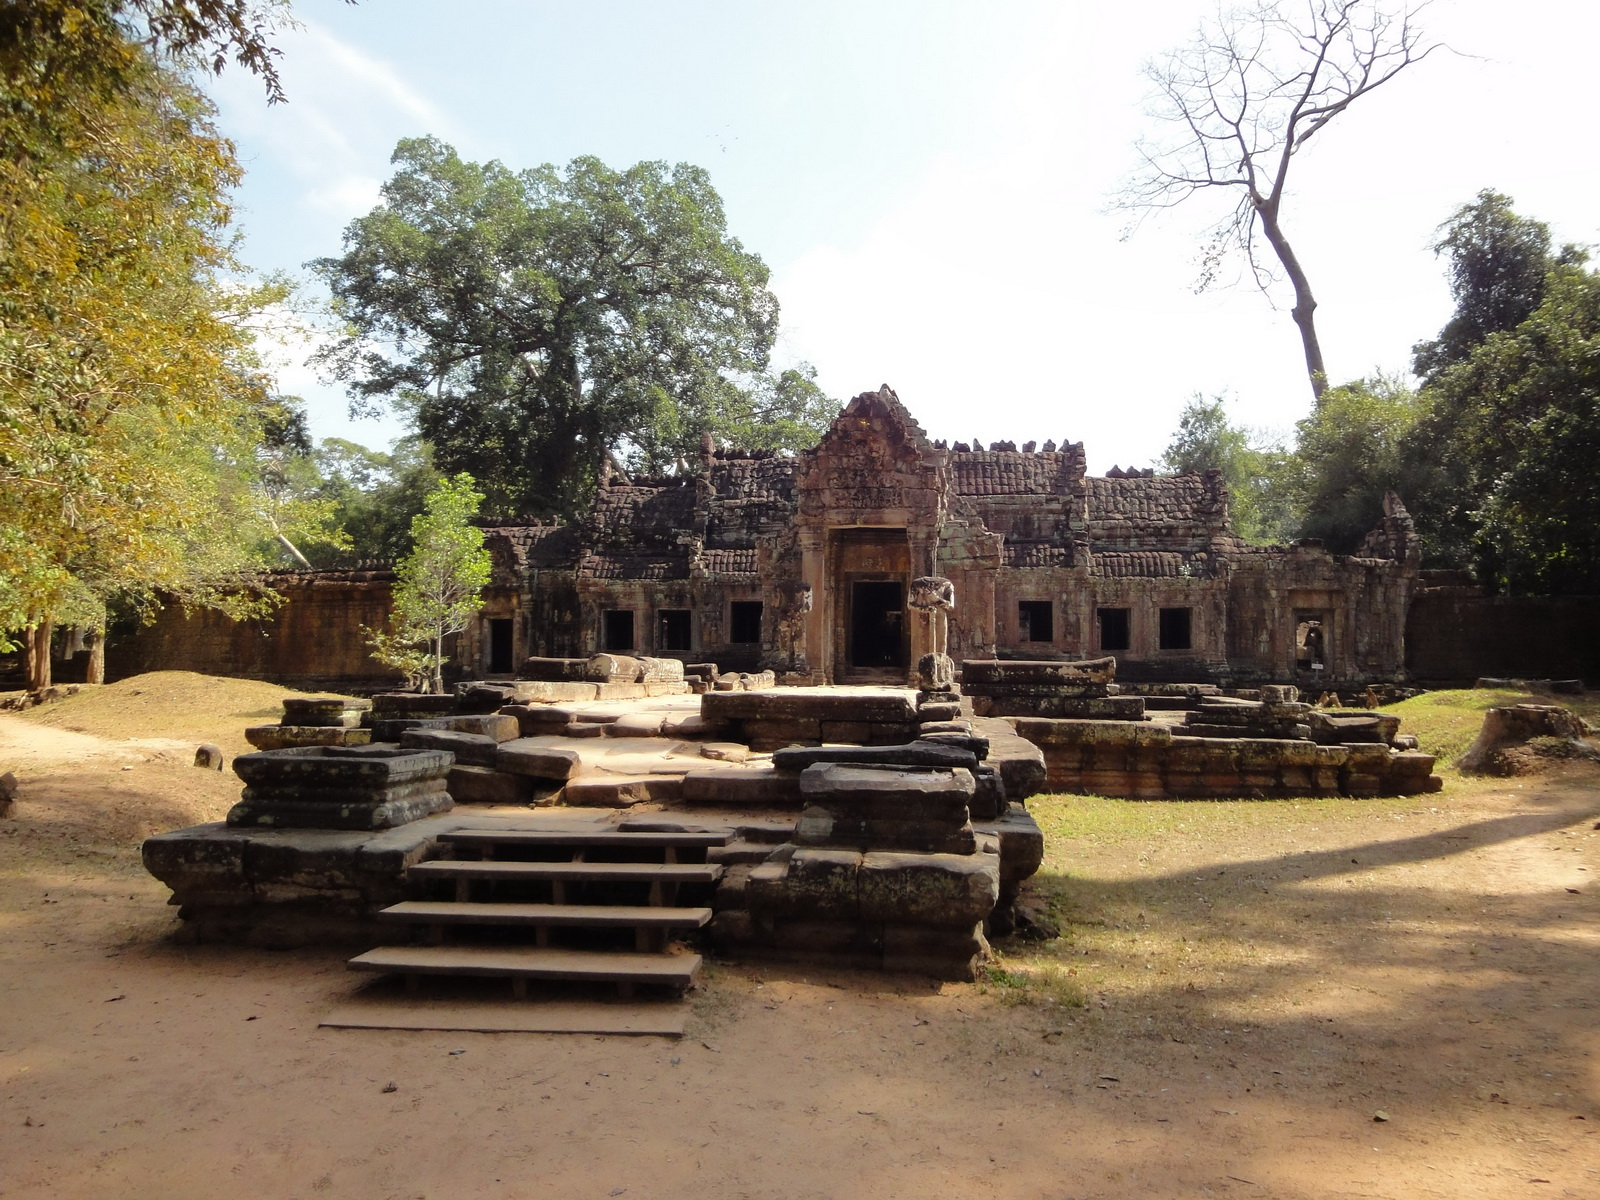 Preah Khan West entrance gopura headless guardians Angkor Thom 01